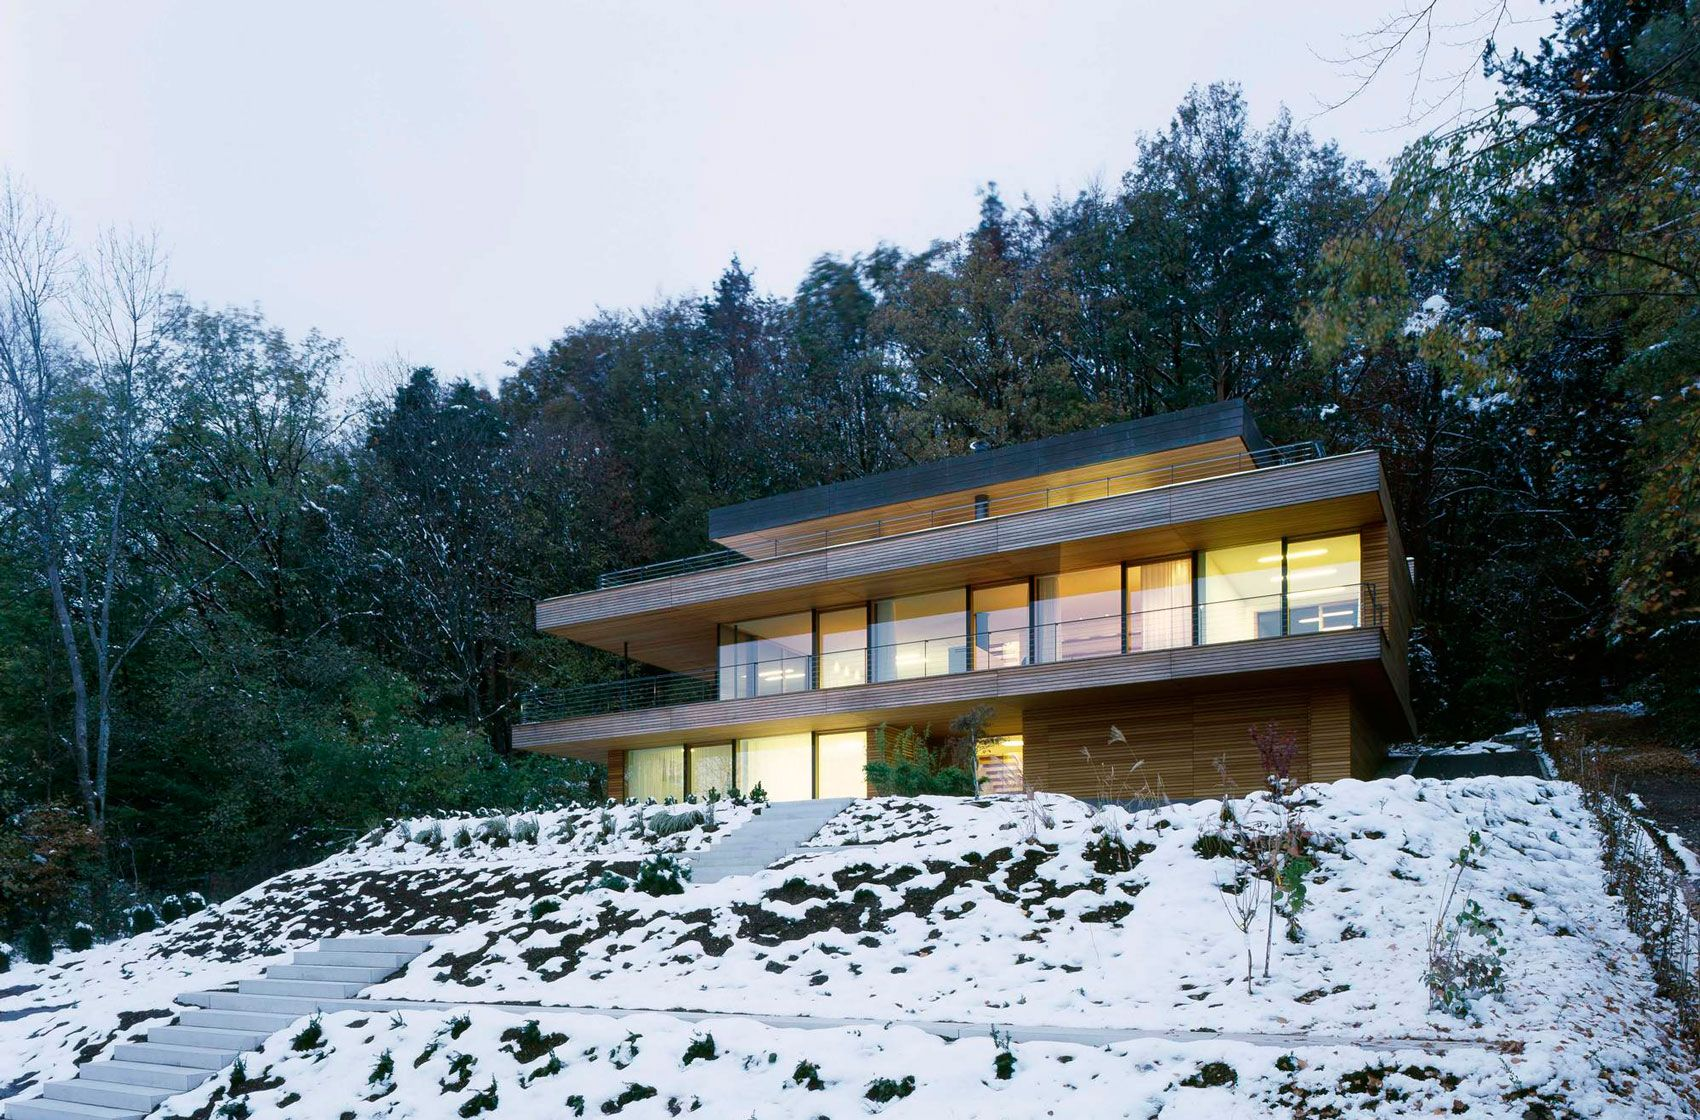 House Heilbronn by k m architektur (18)